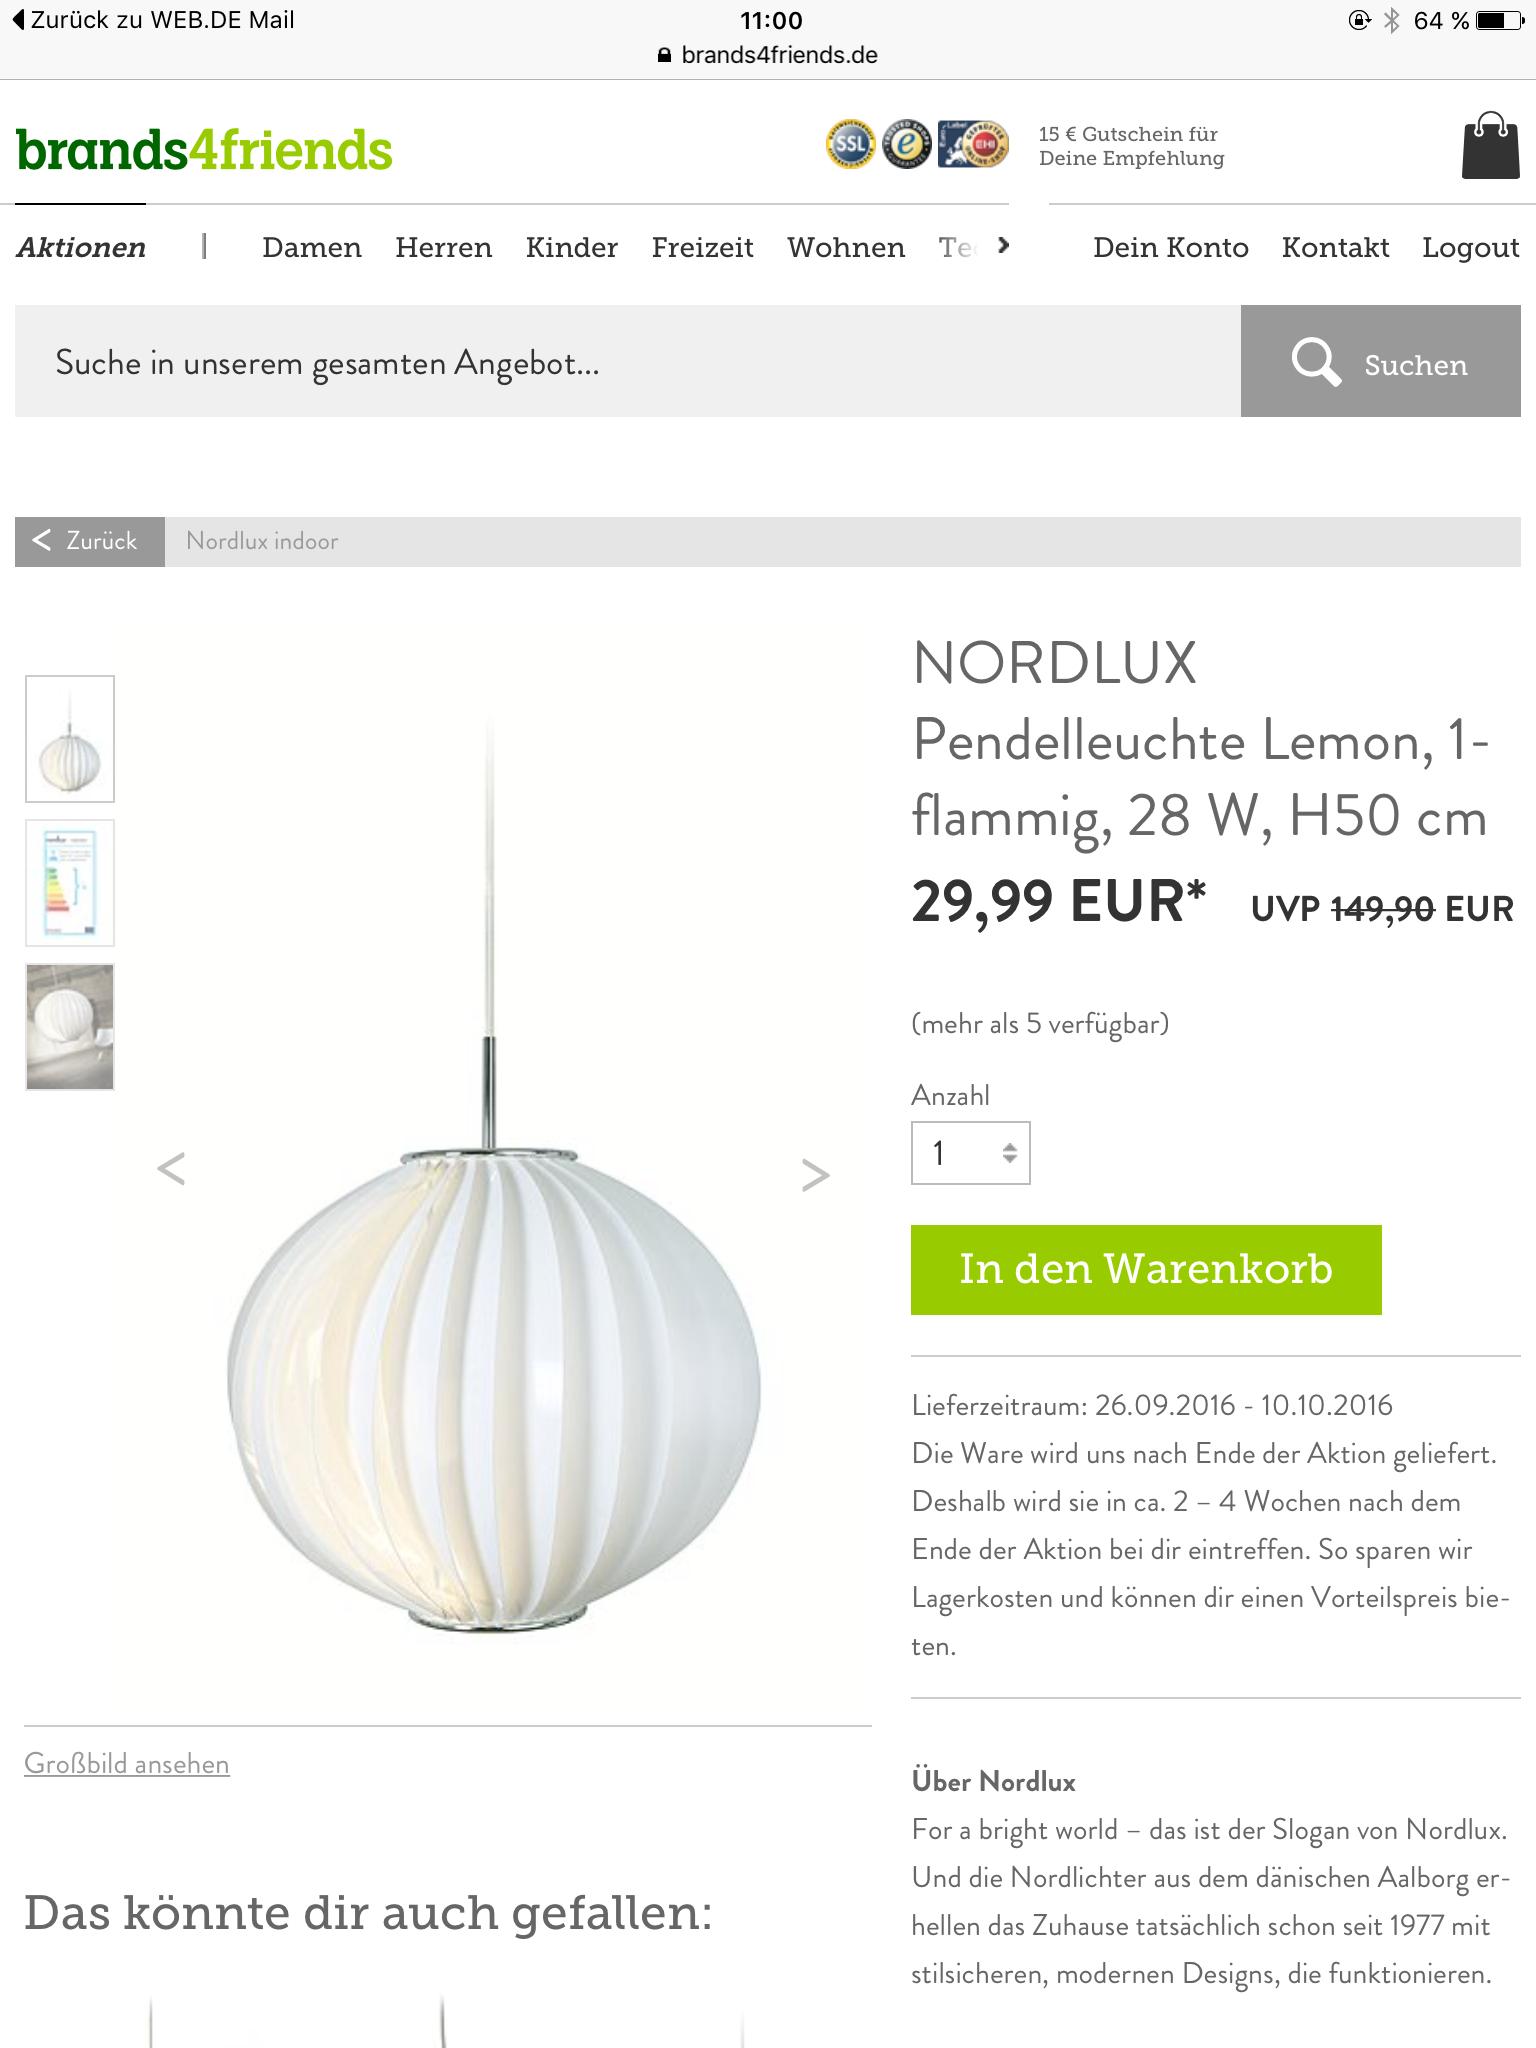 Nordlux Pendelleuchte Lemon (@brands4friends) (knapp50% unter Vergleichspreis)